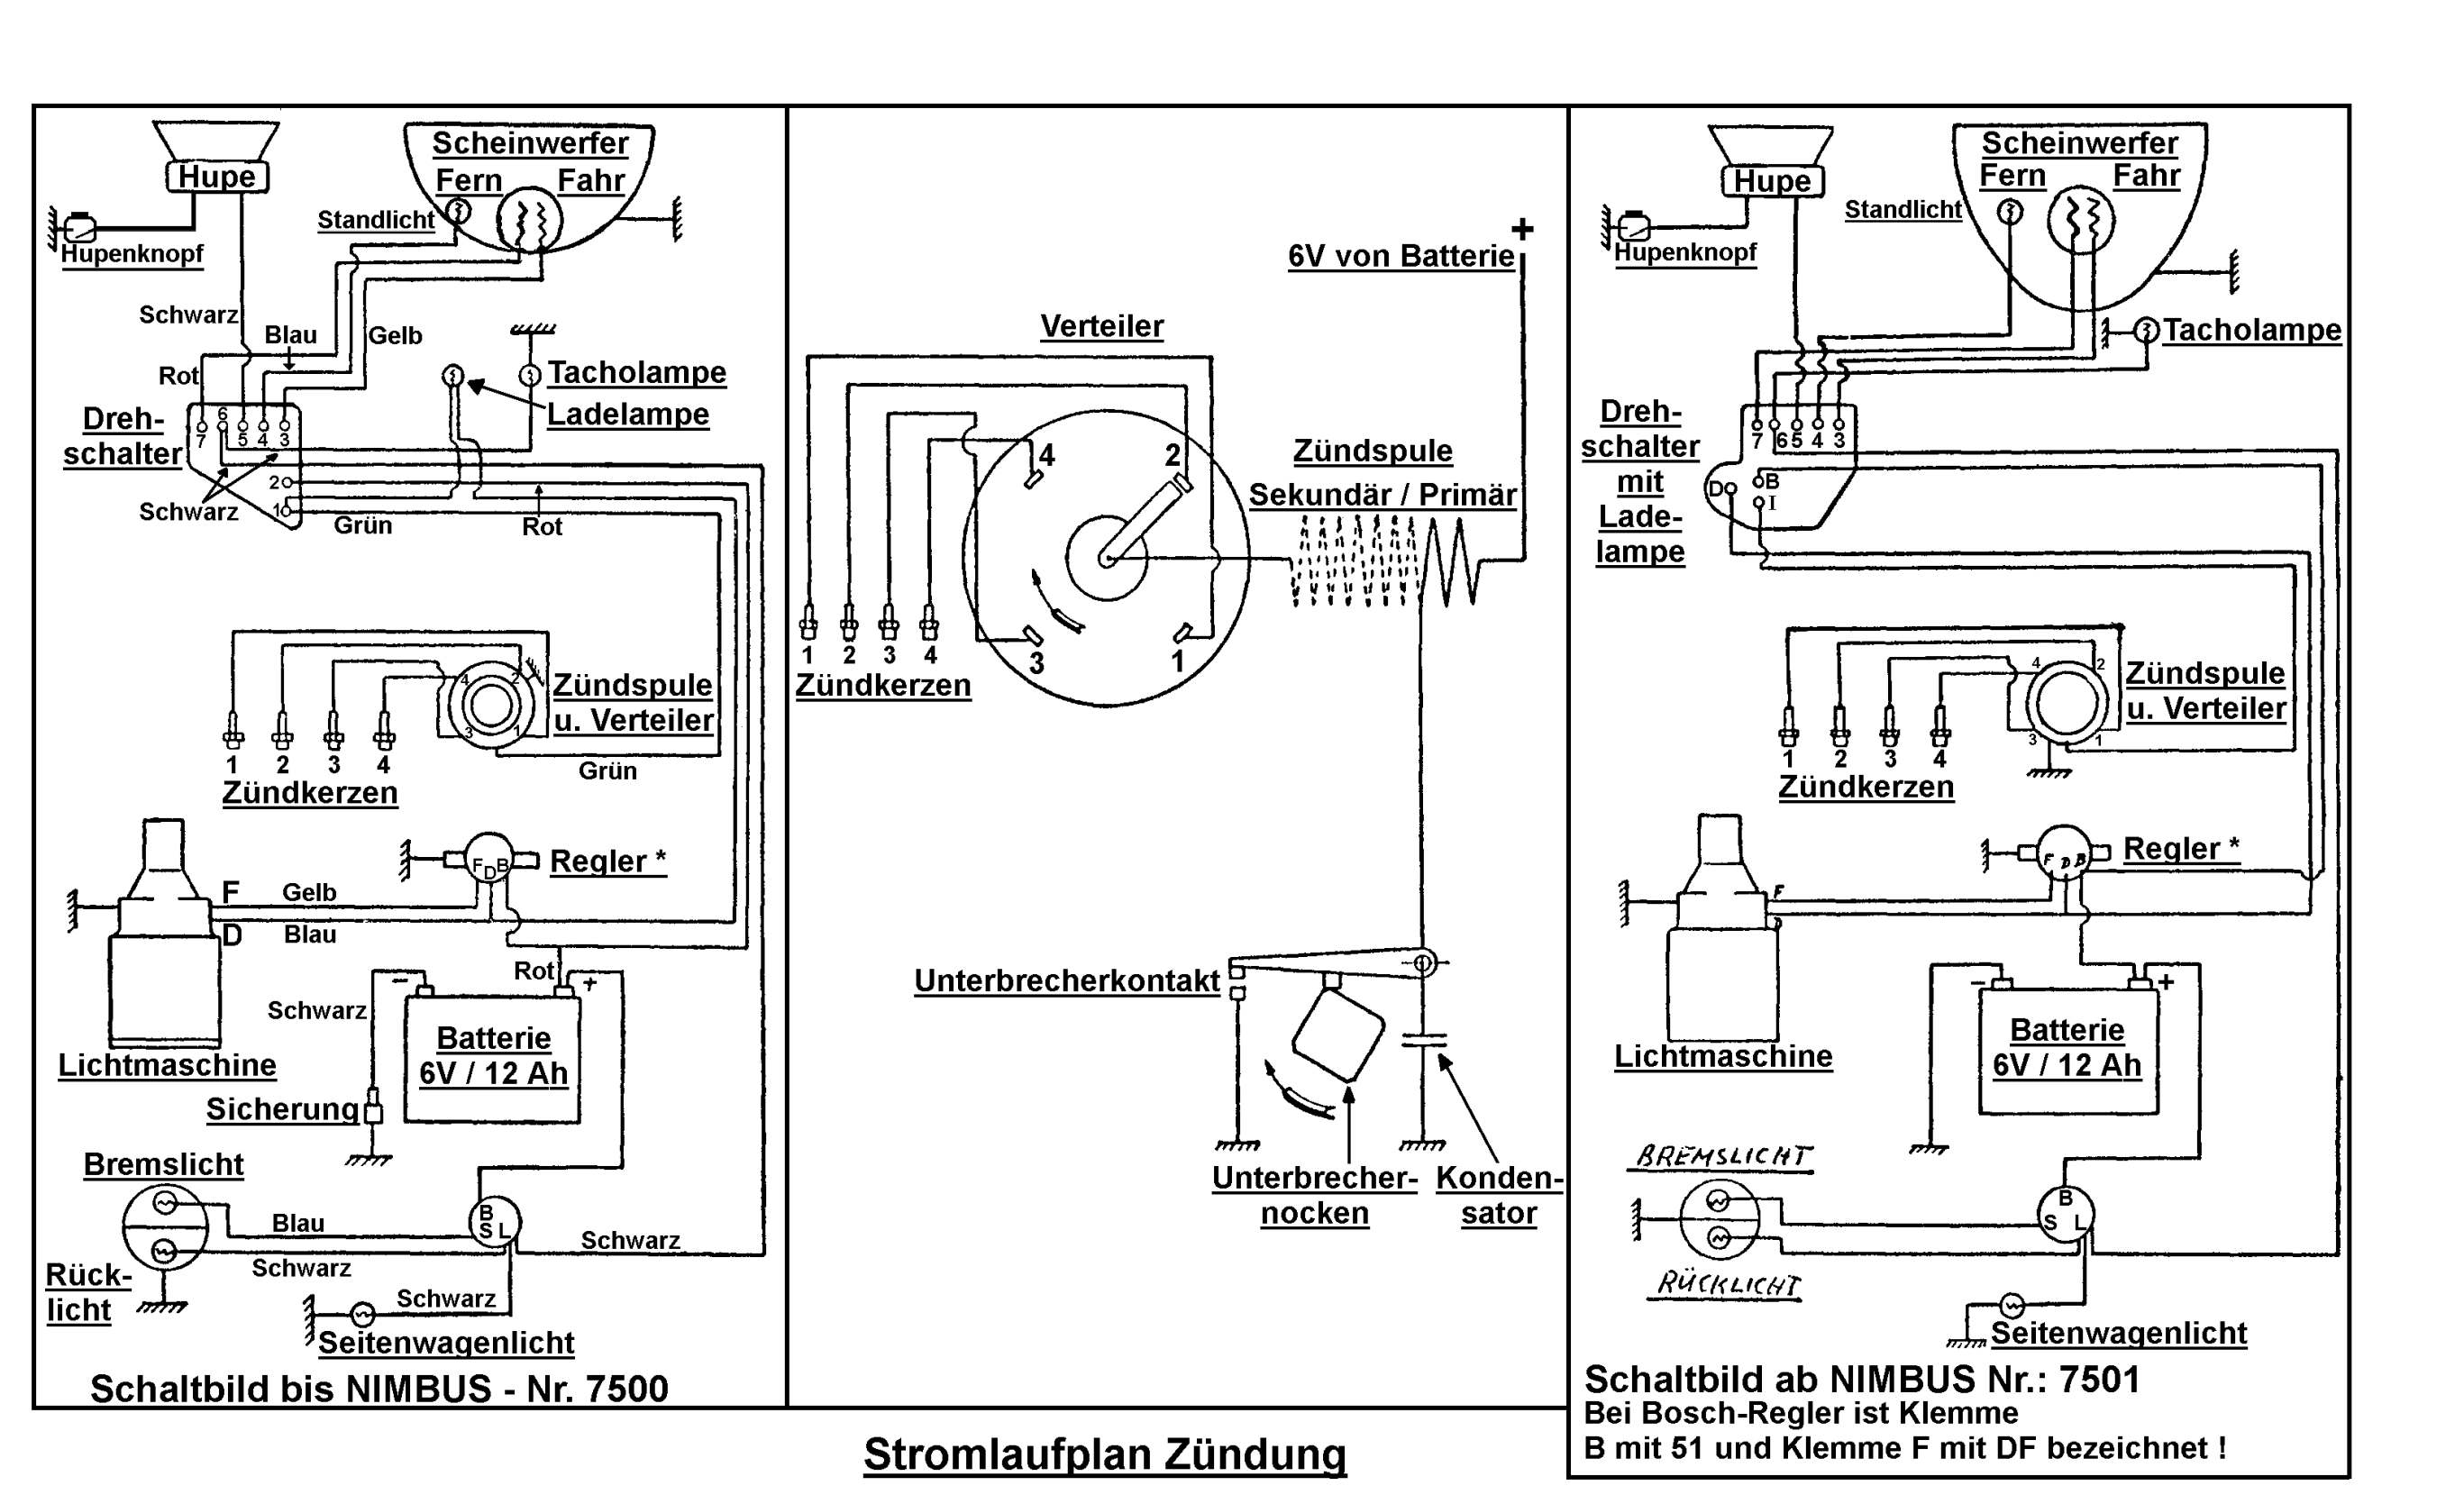 1975 bmw 2002 wiring diagram how to write class r75 6 auto